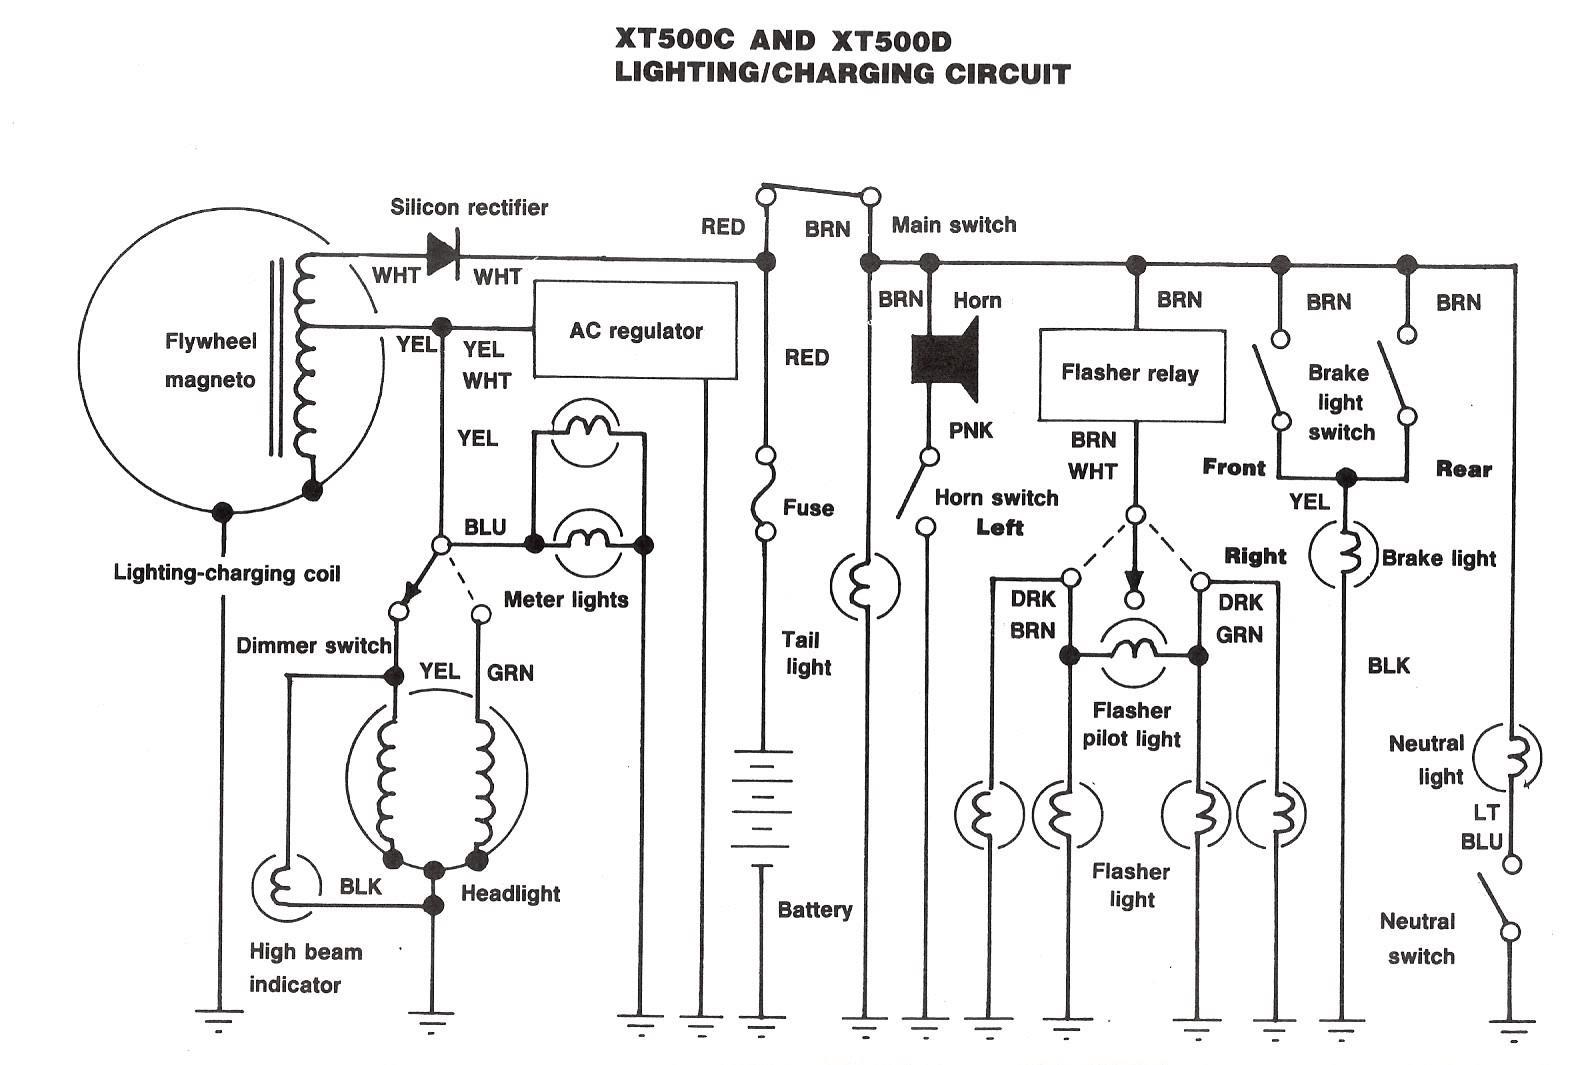 Xt500 Electrical2